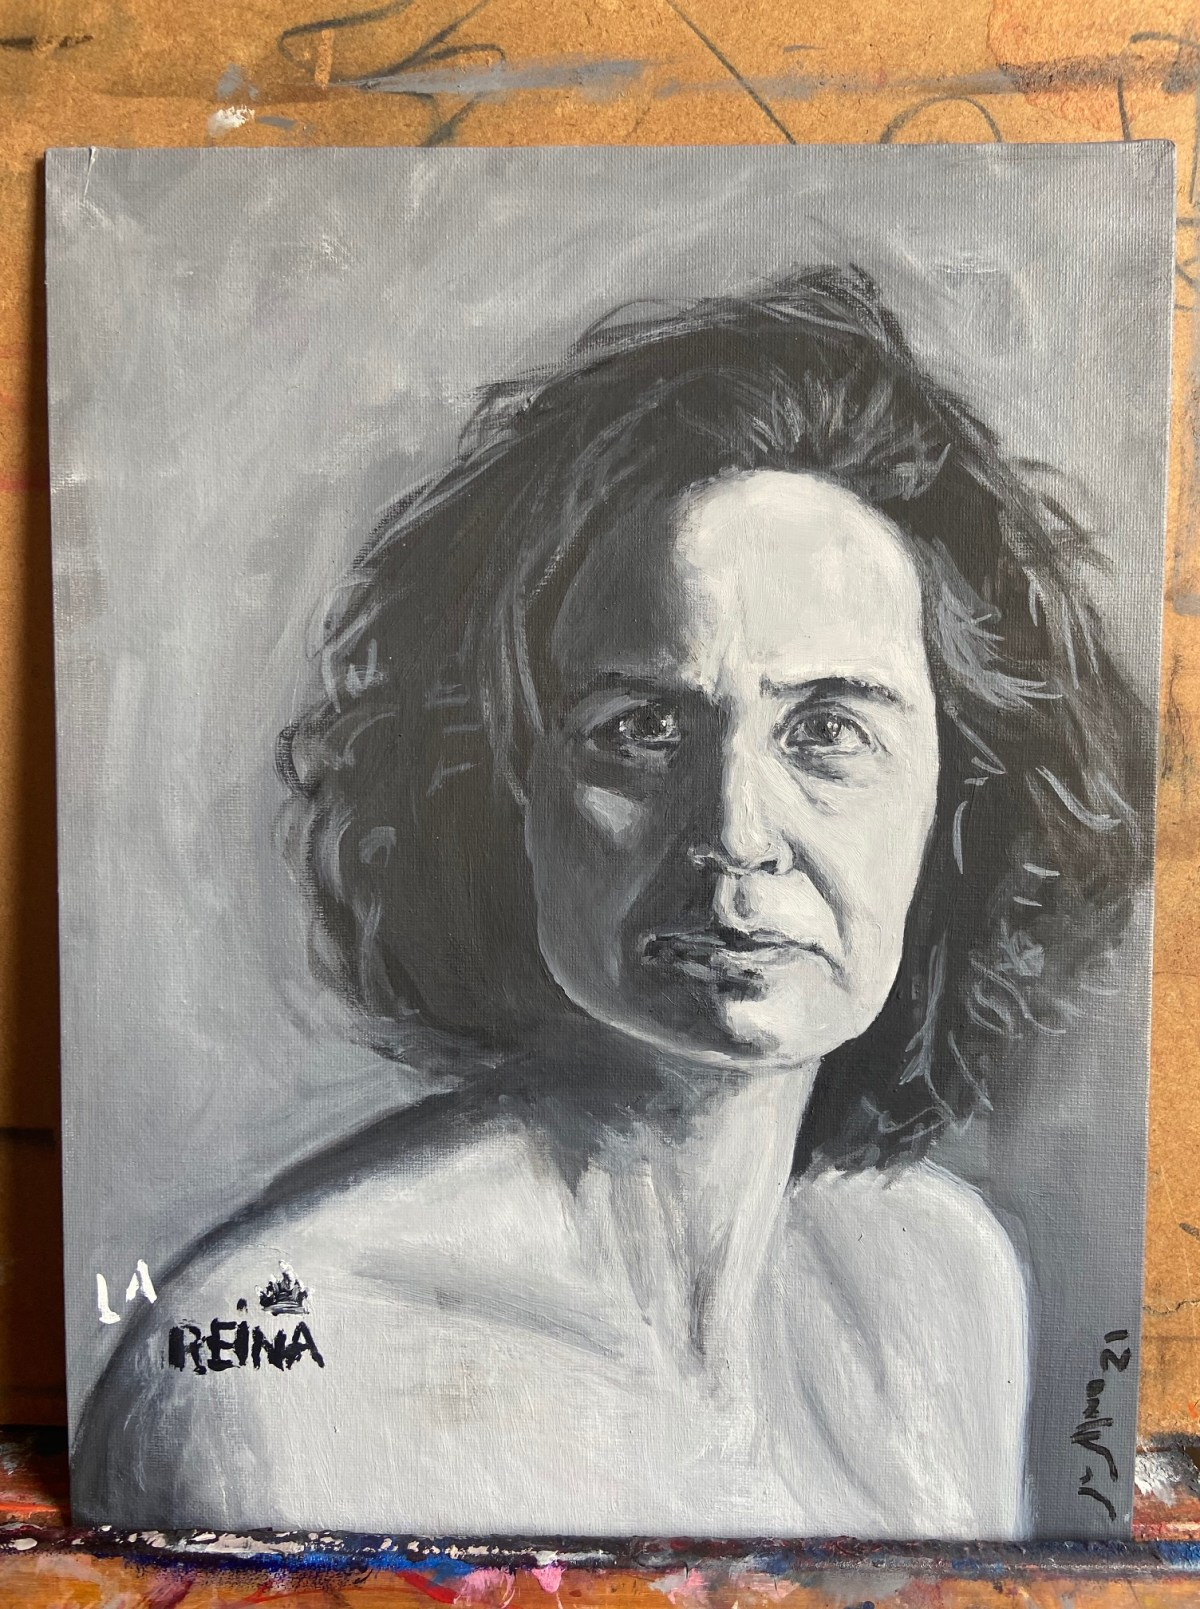 """La Reina"", Justino, óleo em canvas board, 35 cm x 28 cm, 2021."